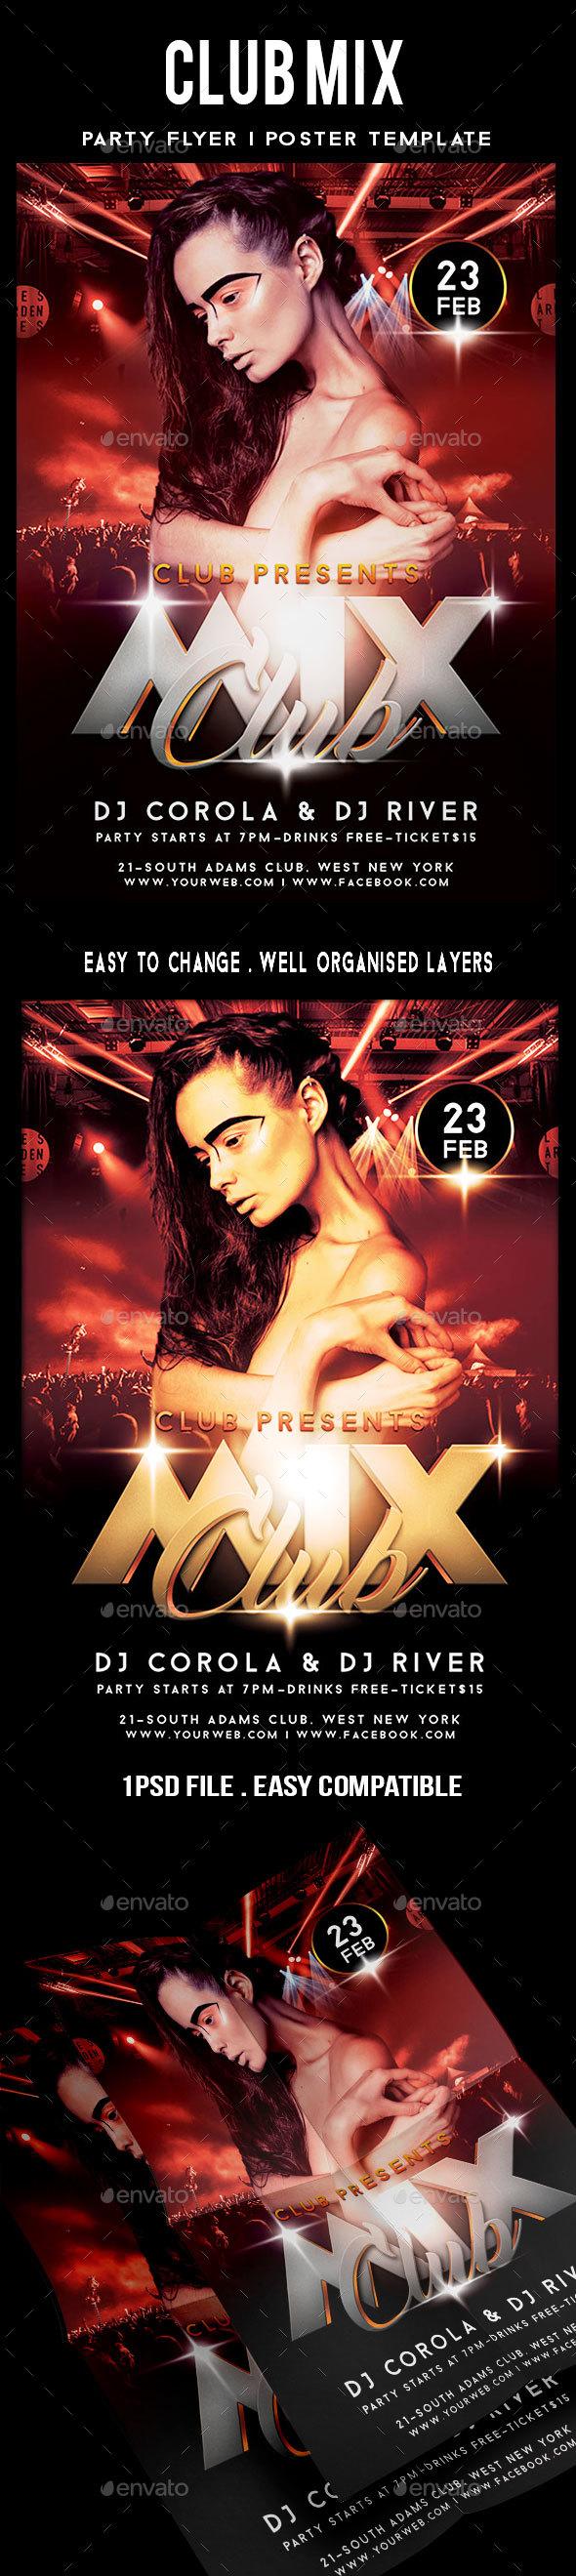 Club Mix Party Flyer - Events Flyers